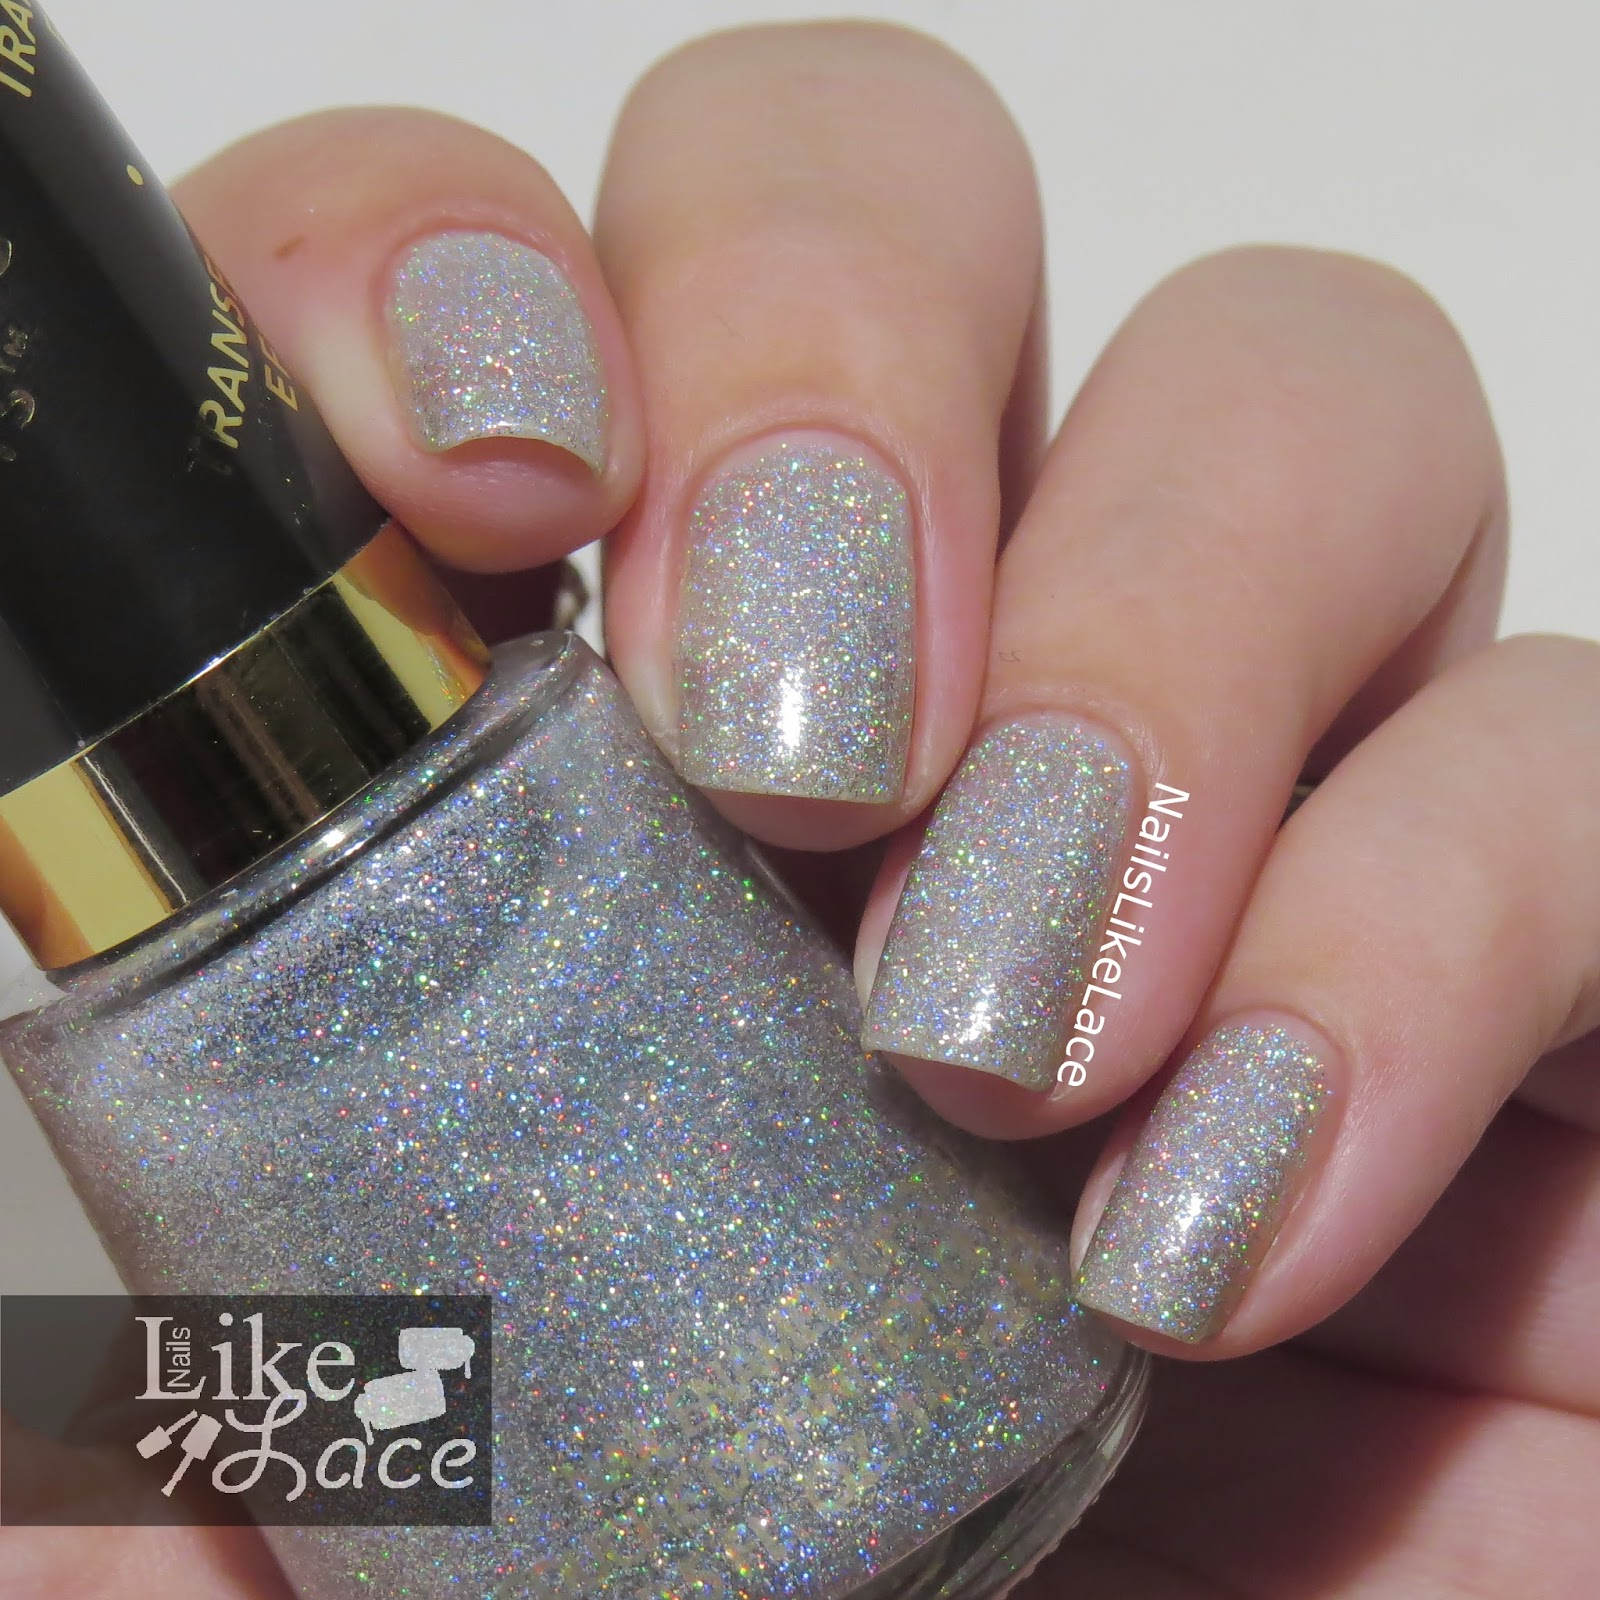 Nailslikelace Revlon Holographic Pearls